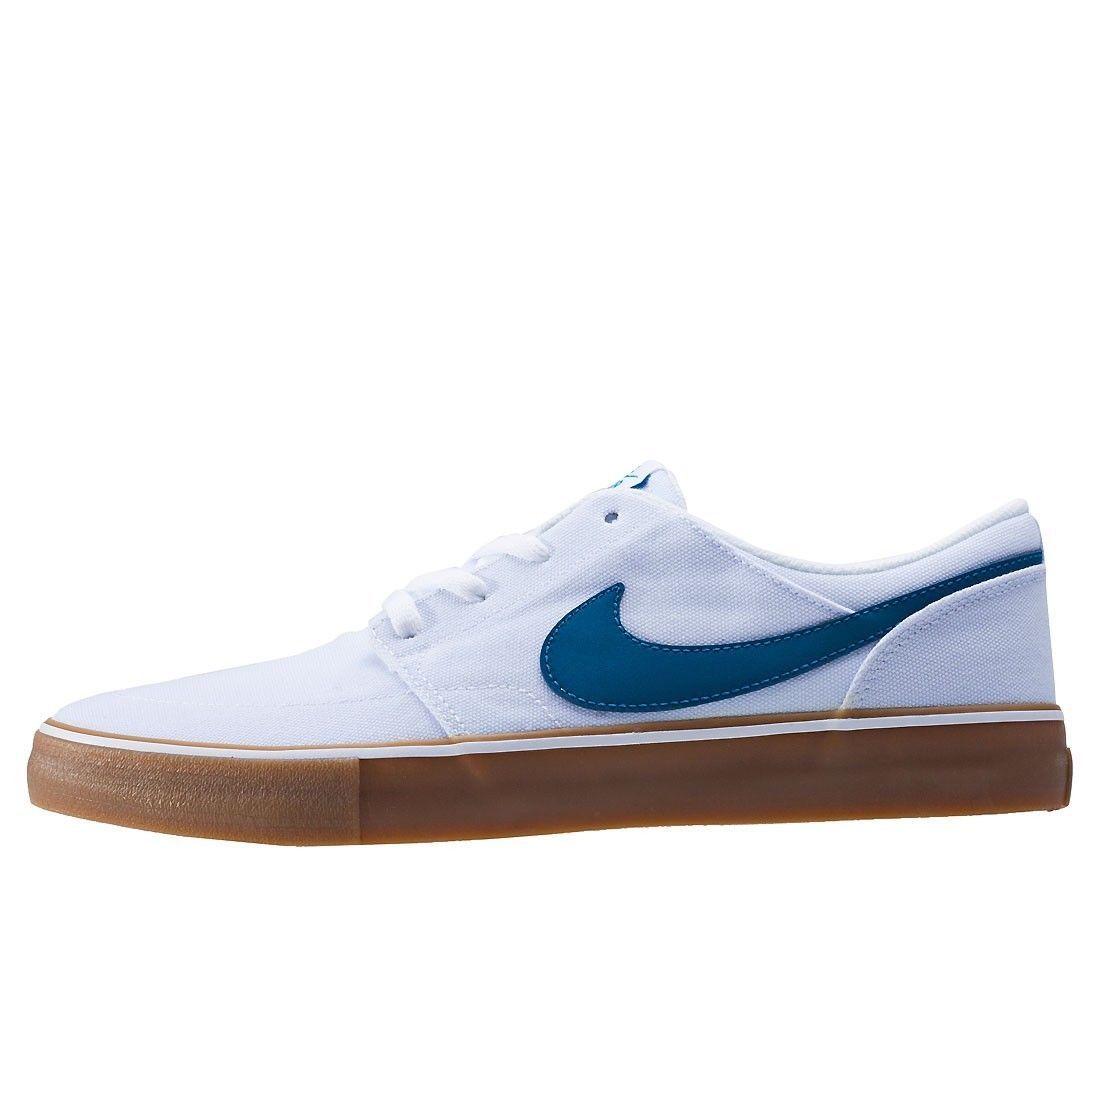 Nike SB Portmore II Solar CNVS Canvas White/Blue Mens Skate Shoes 880268-149 image 3